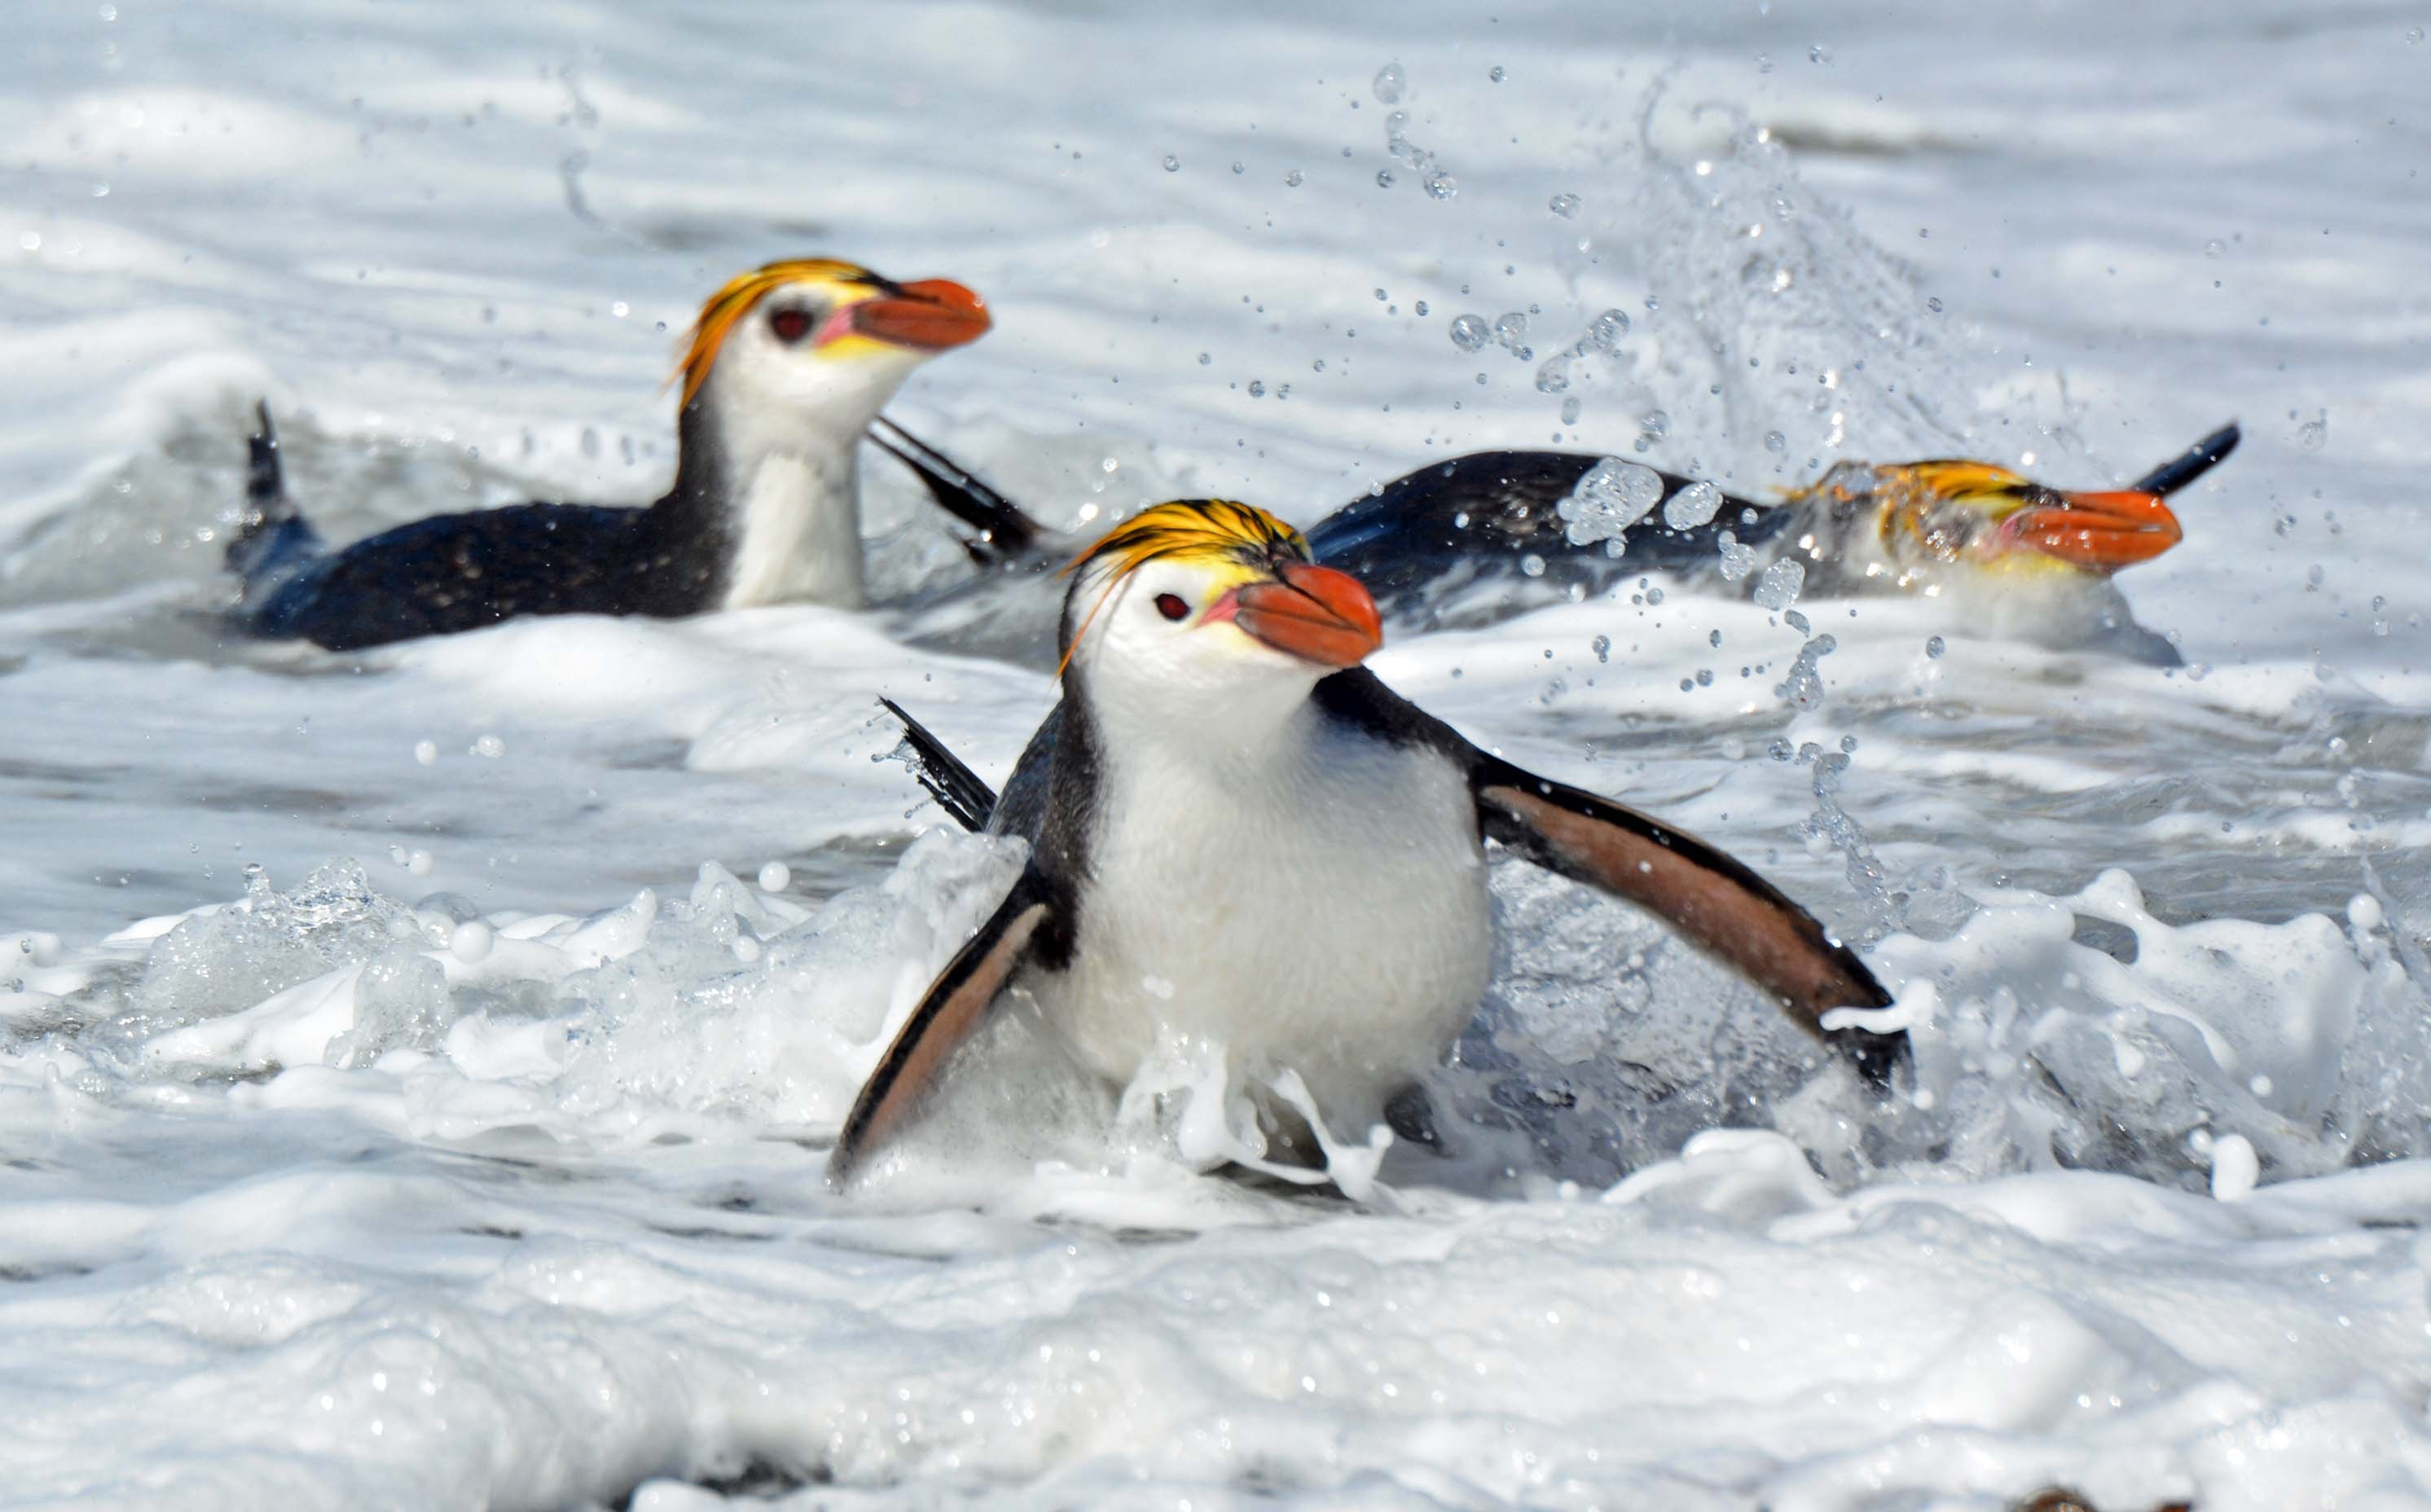 Royal Penguin Wallpapers